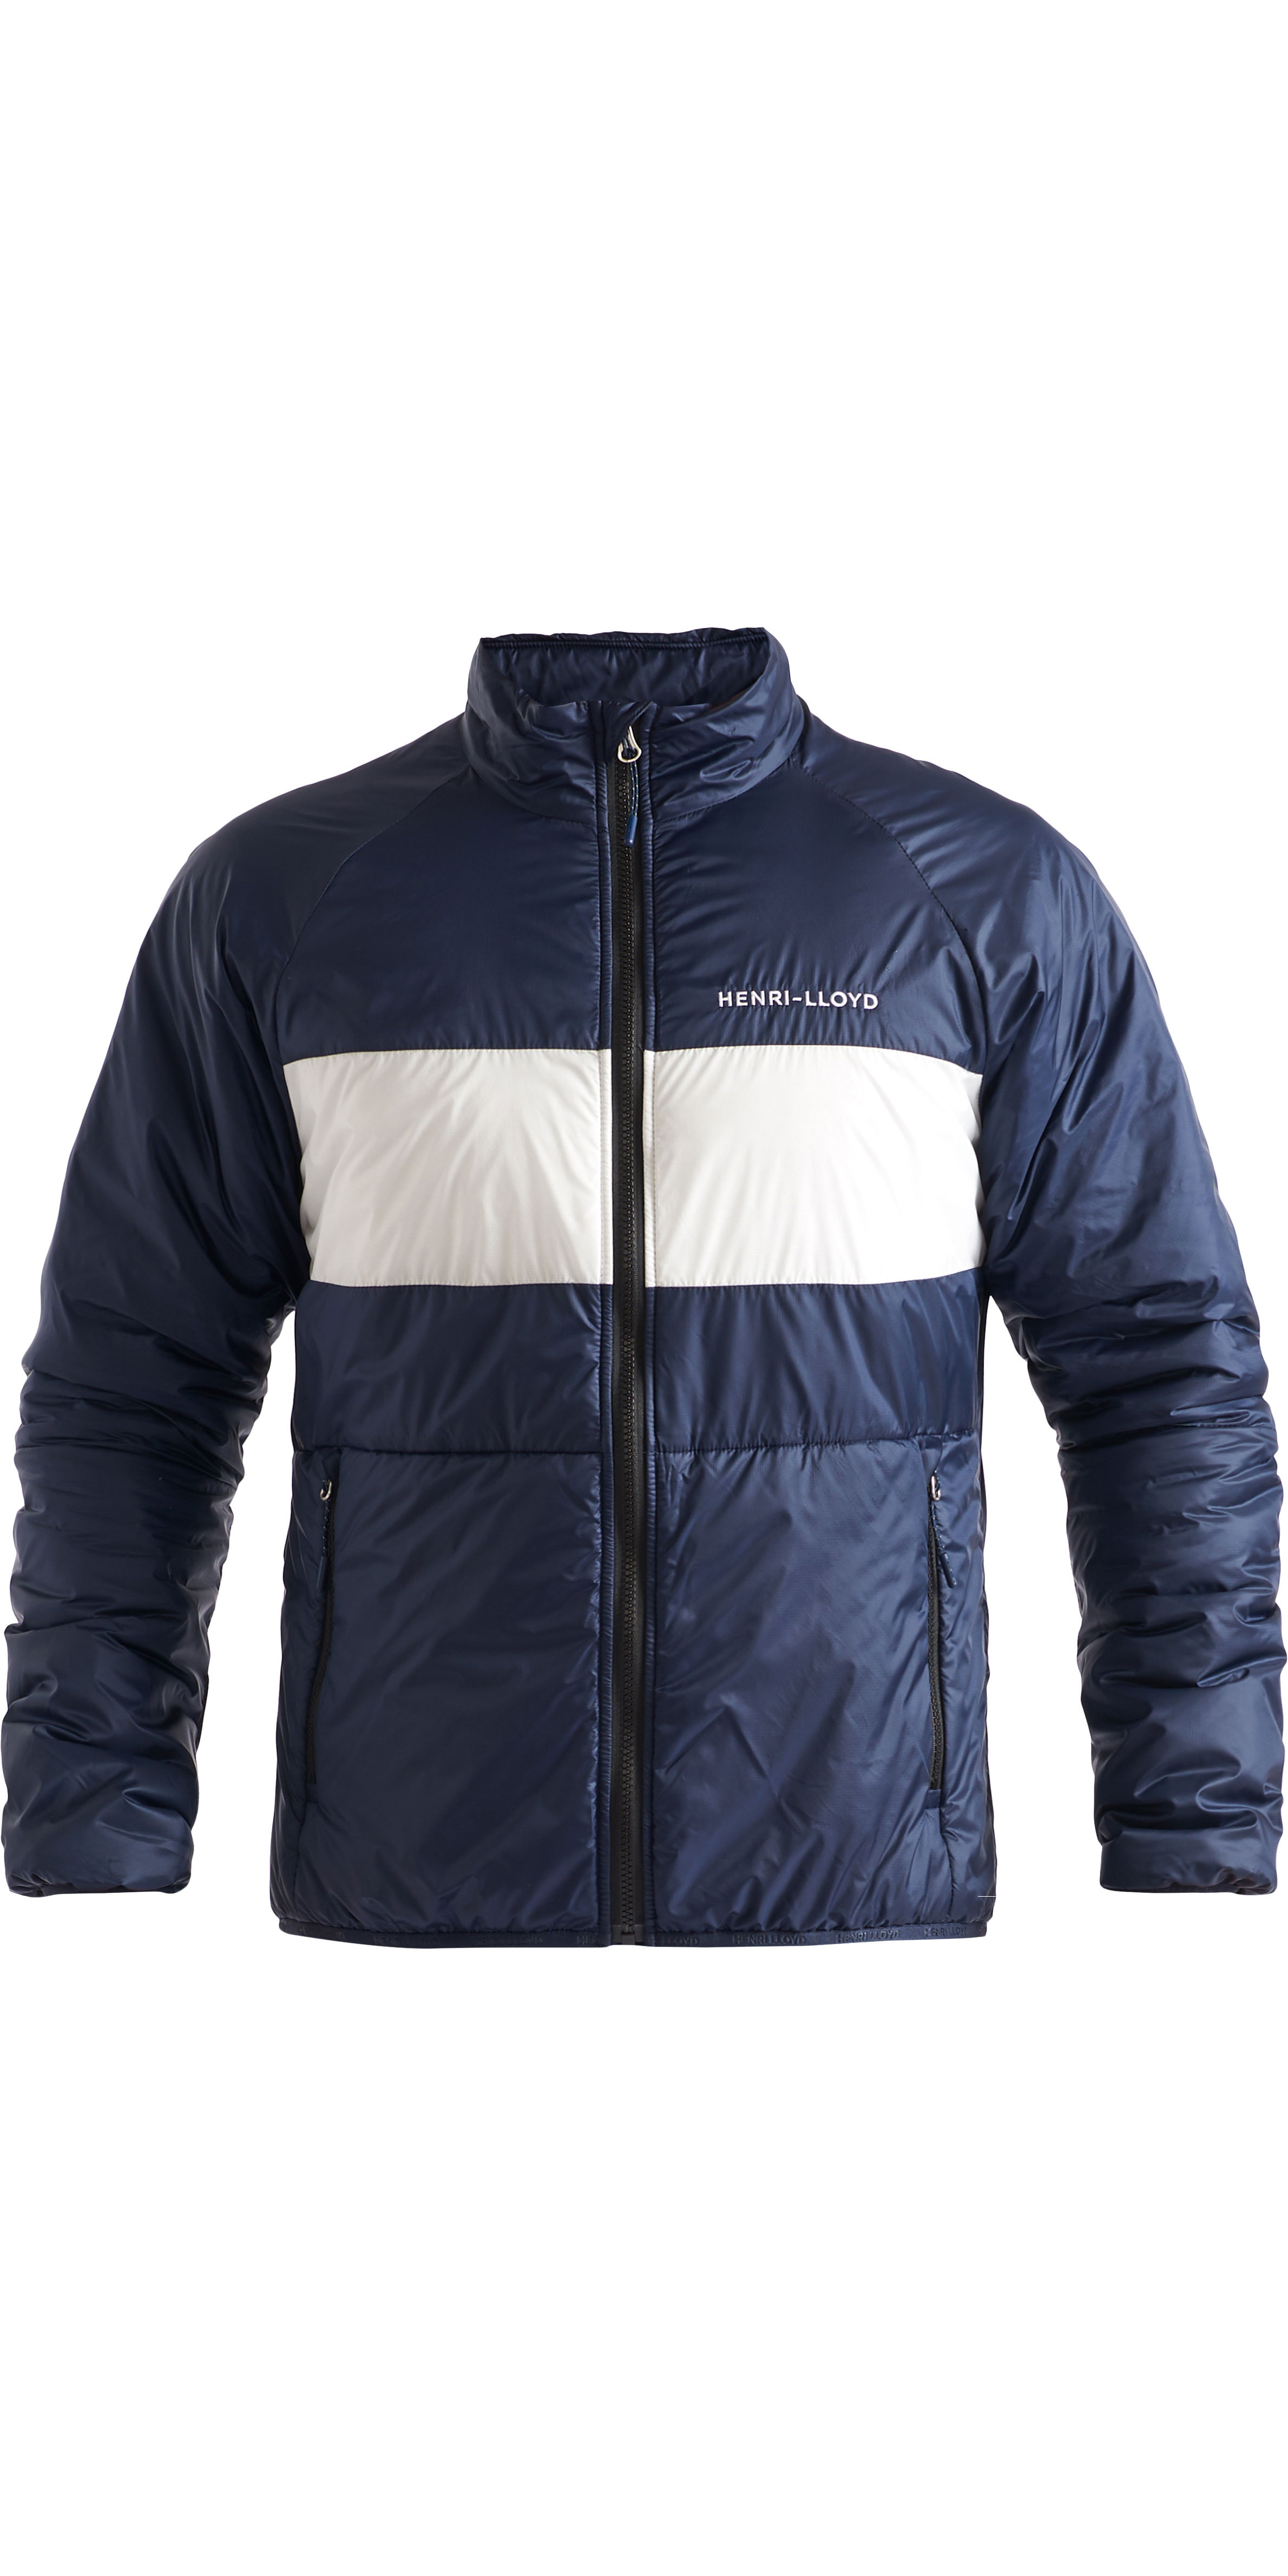 2020 Henri Lloyd Mens Maverick Liner Mid Layer Jacket P201110054 - Navy Block